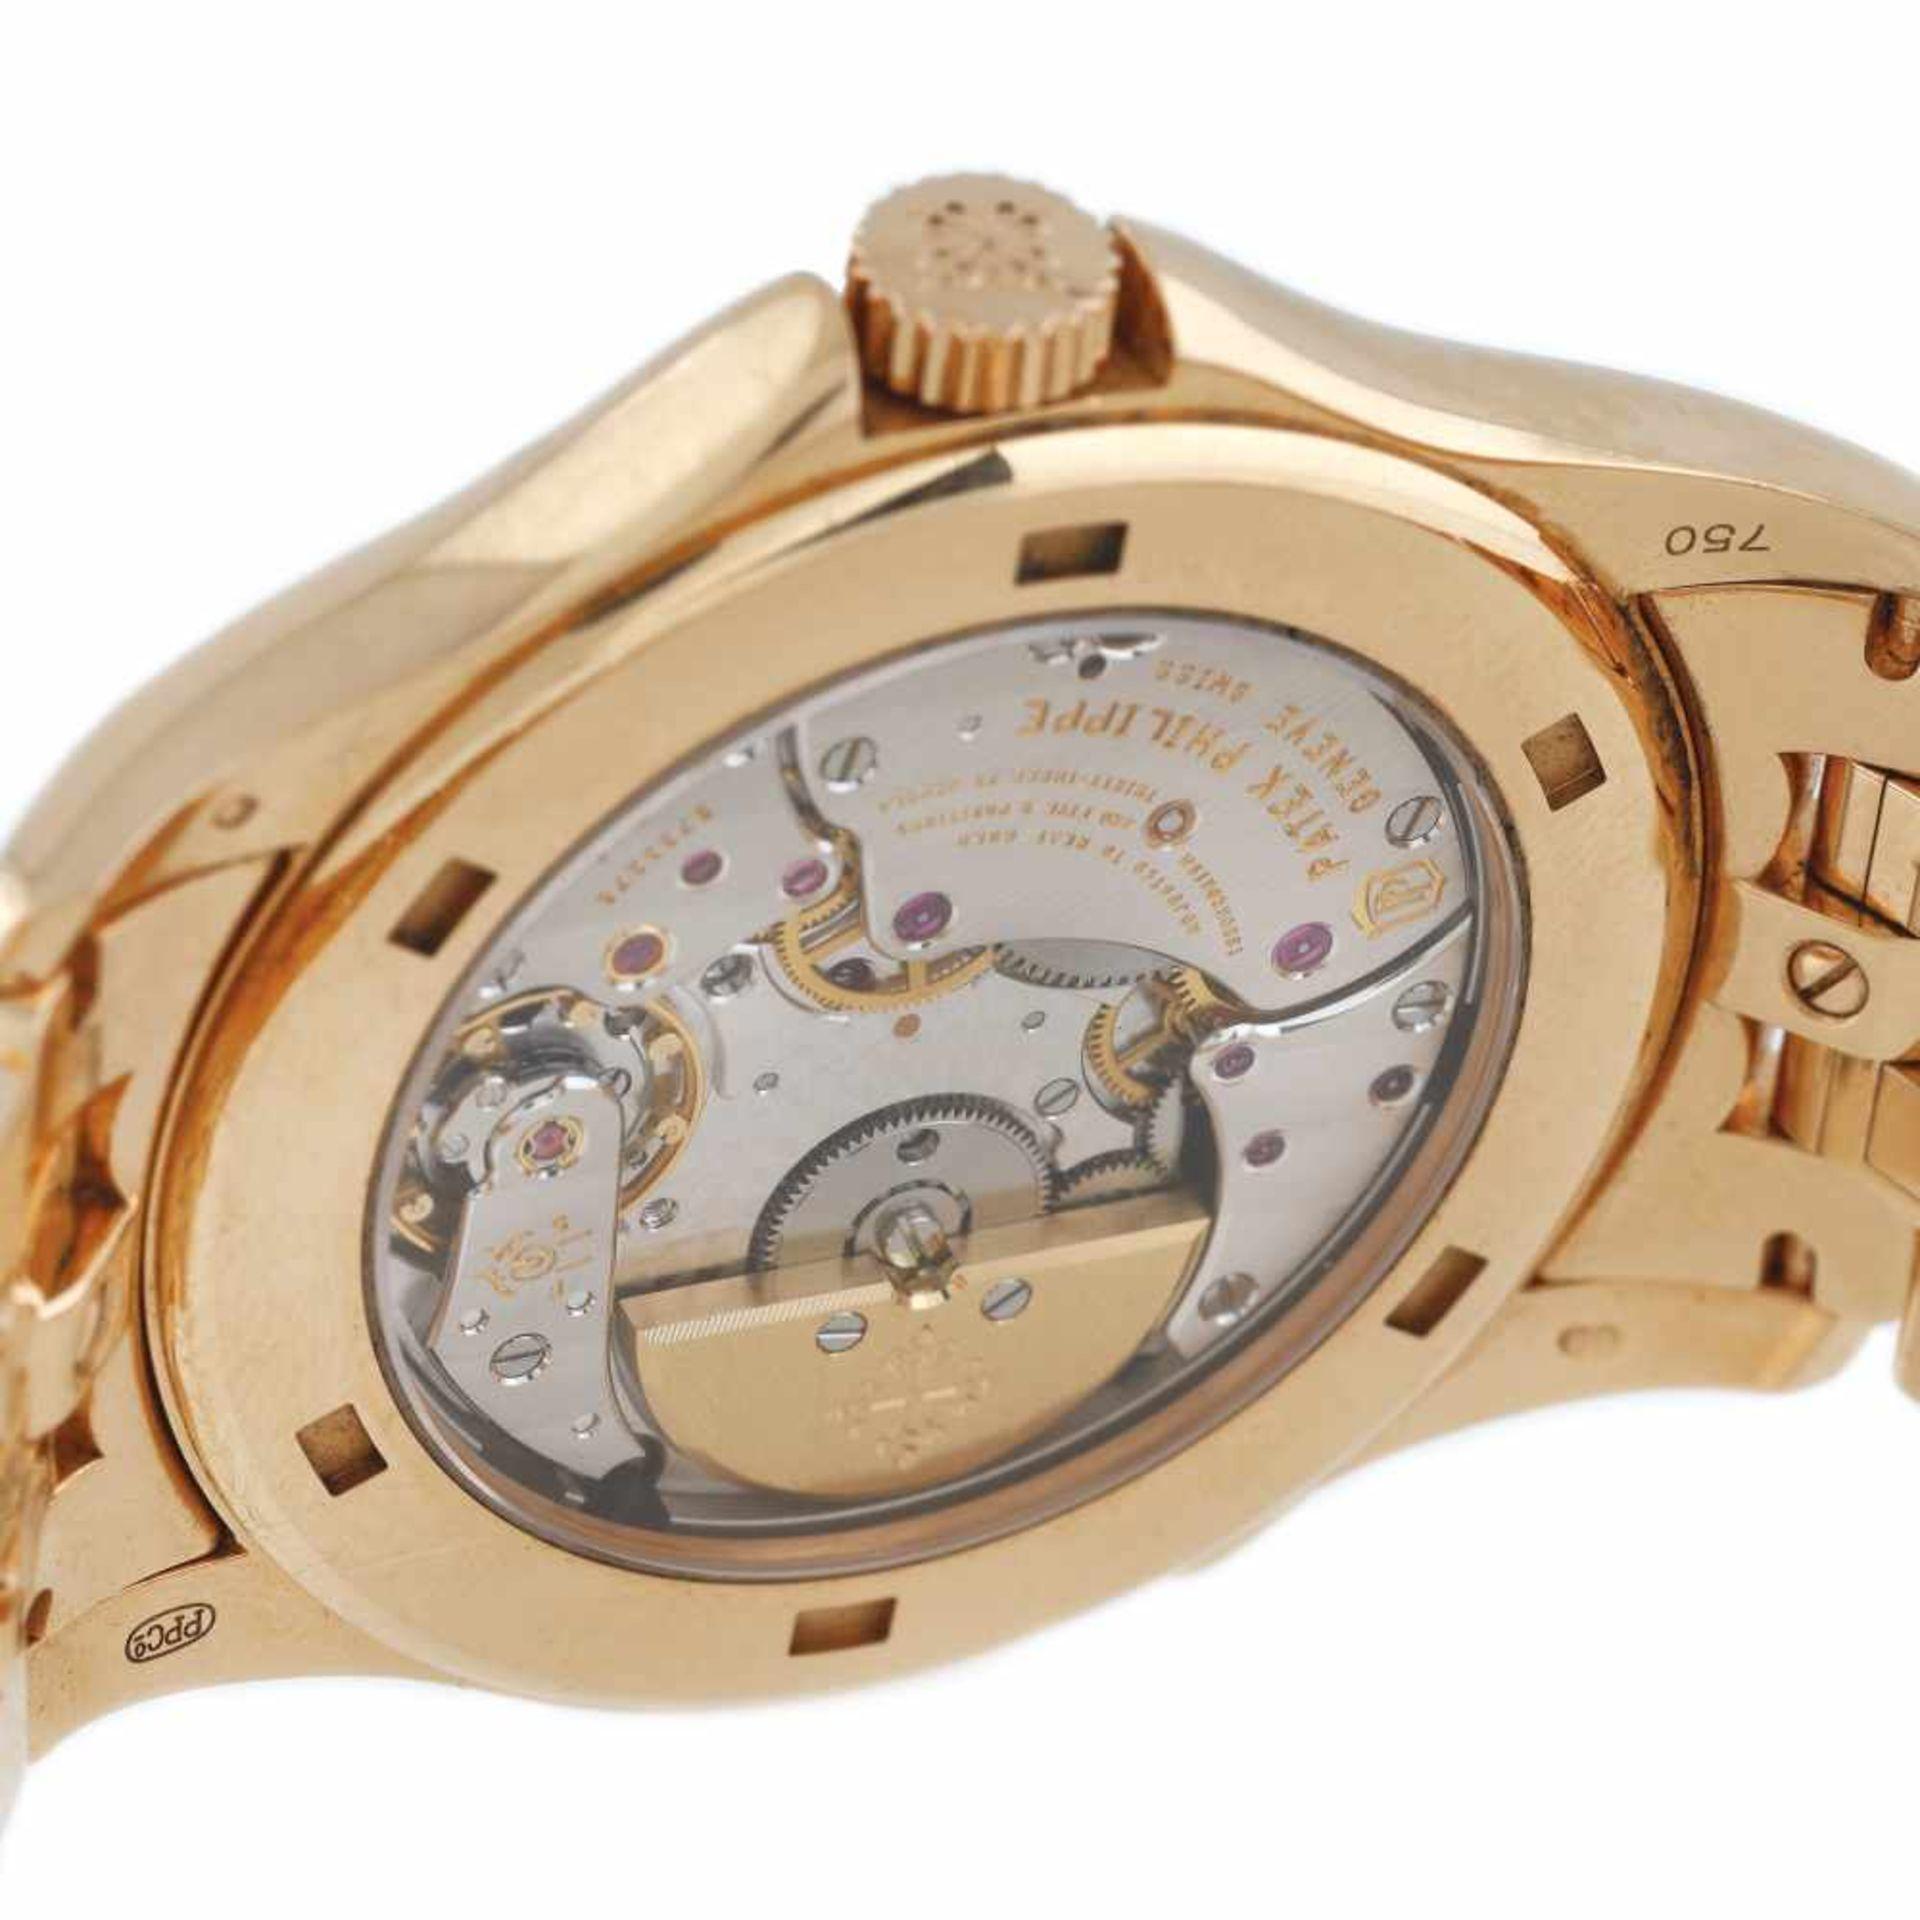 Patek Phillipe World Time wristwatch, gold, men, provenance documents and original box - Bild 3 aus 3